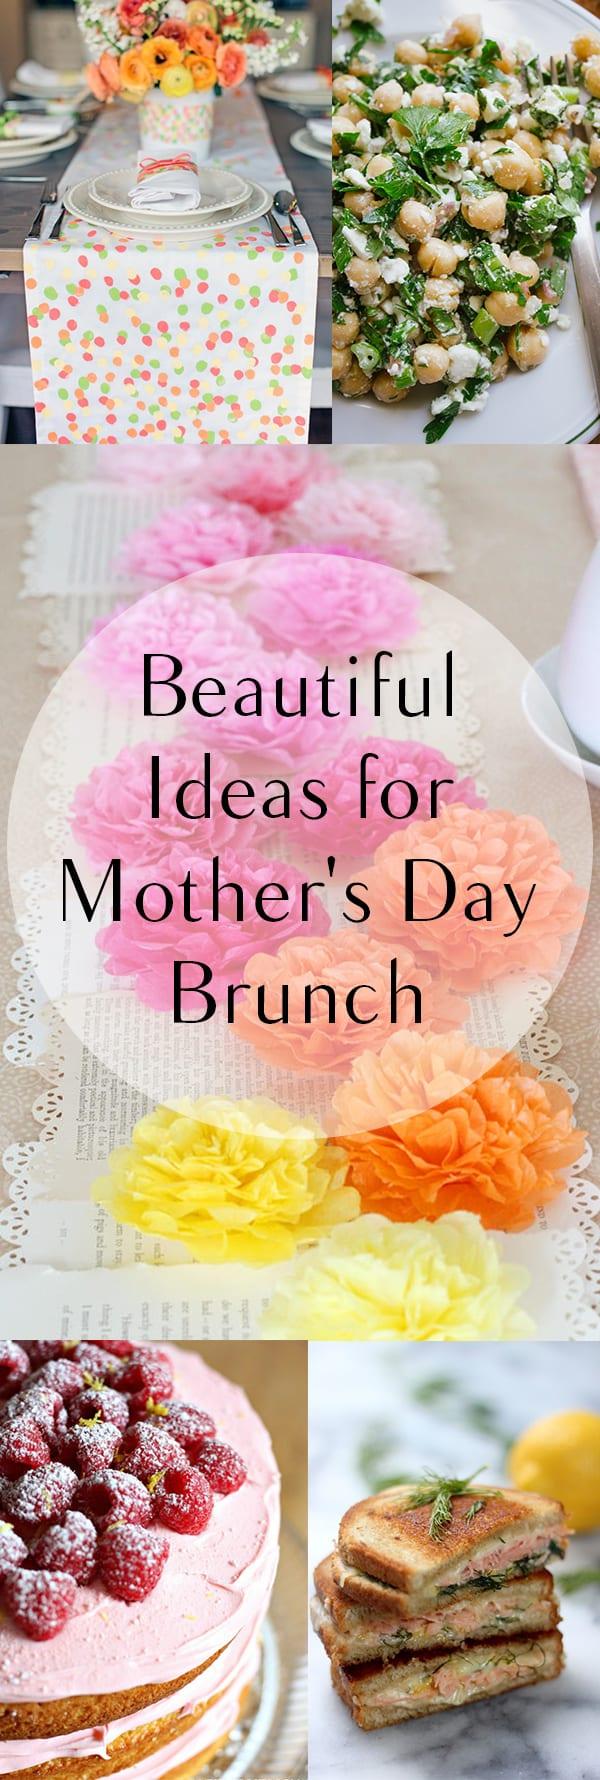 Mothers Day, Mothers Day Lunch, Mothers Day Brunch, Mothers Day Gifts, Mothers Day Gifts DIY, DIY Gift Ideas, Gift Ideas, Holiday, Holiday Home Decor